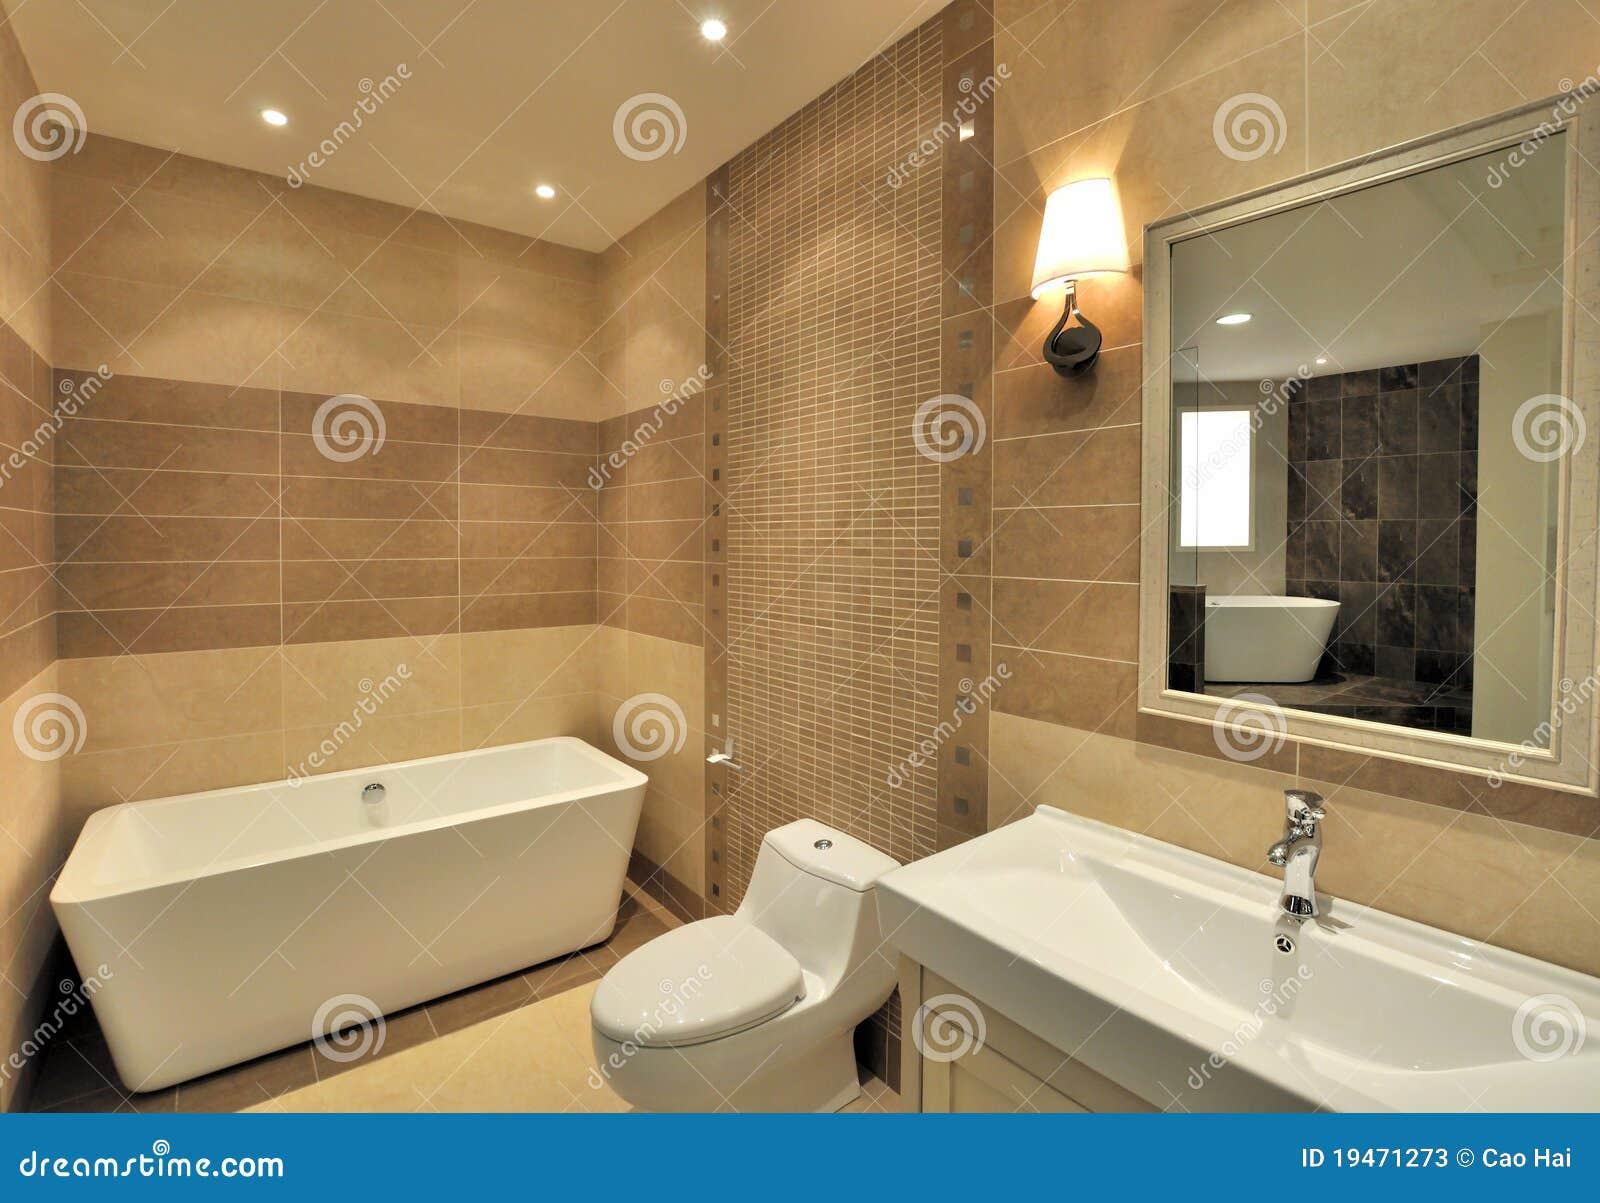 Washroom inside Stock Photos. Washroom Interior Setting Stock Photos   Royalty Free Pictures